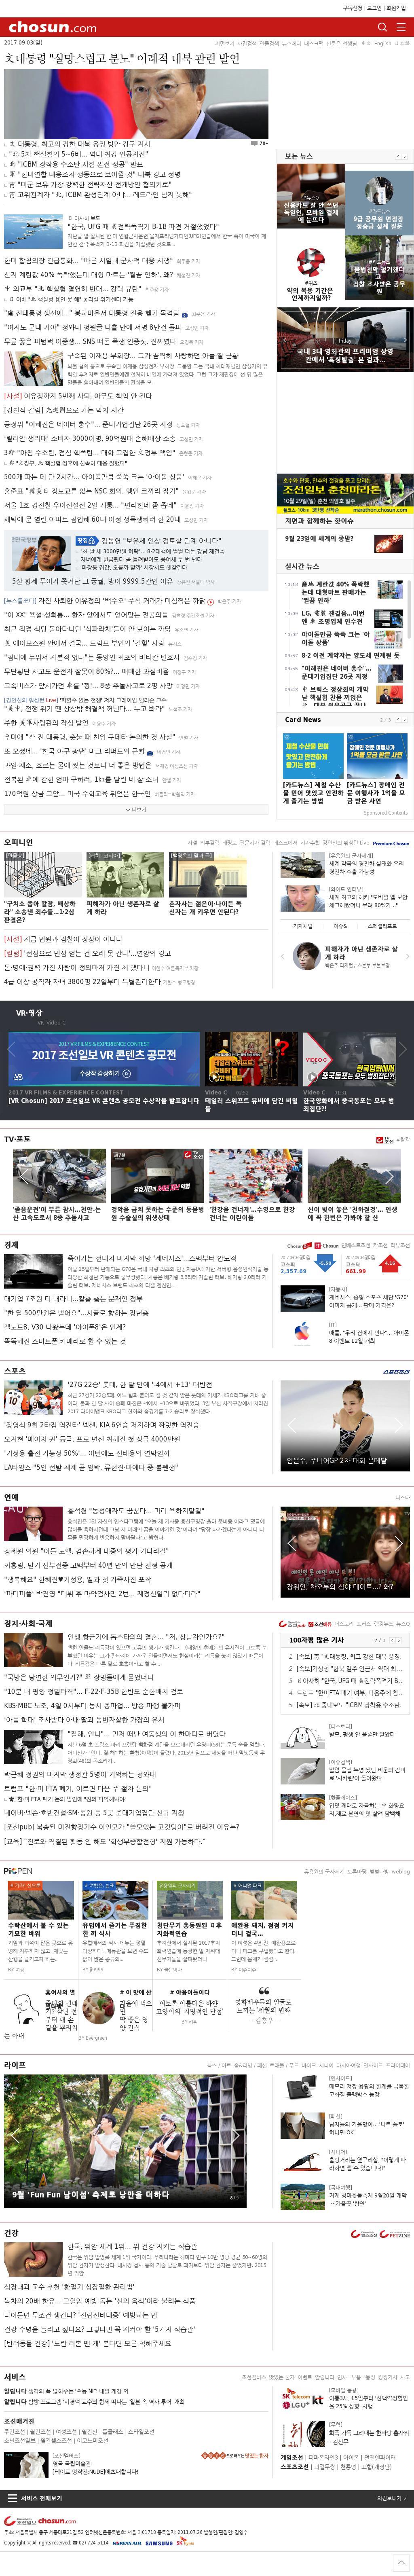 chosun.com at Sunday Sept. 3, 2017, 11:02 a.m. UTC